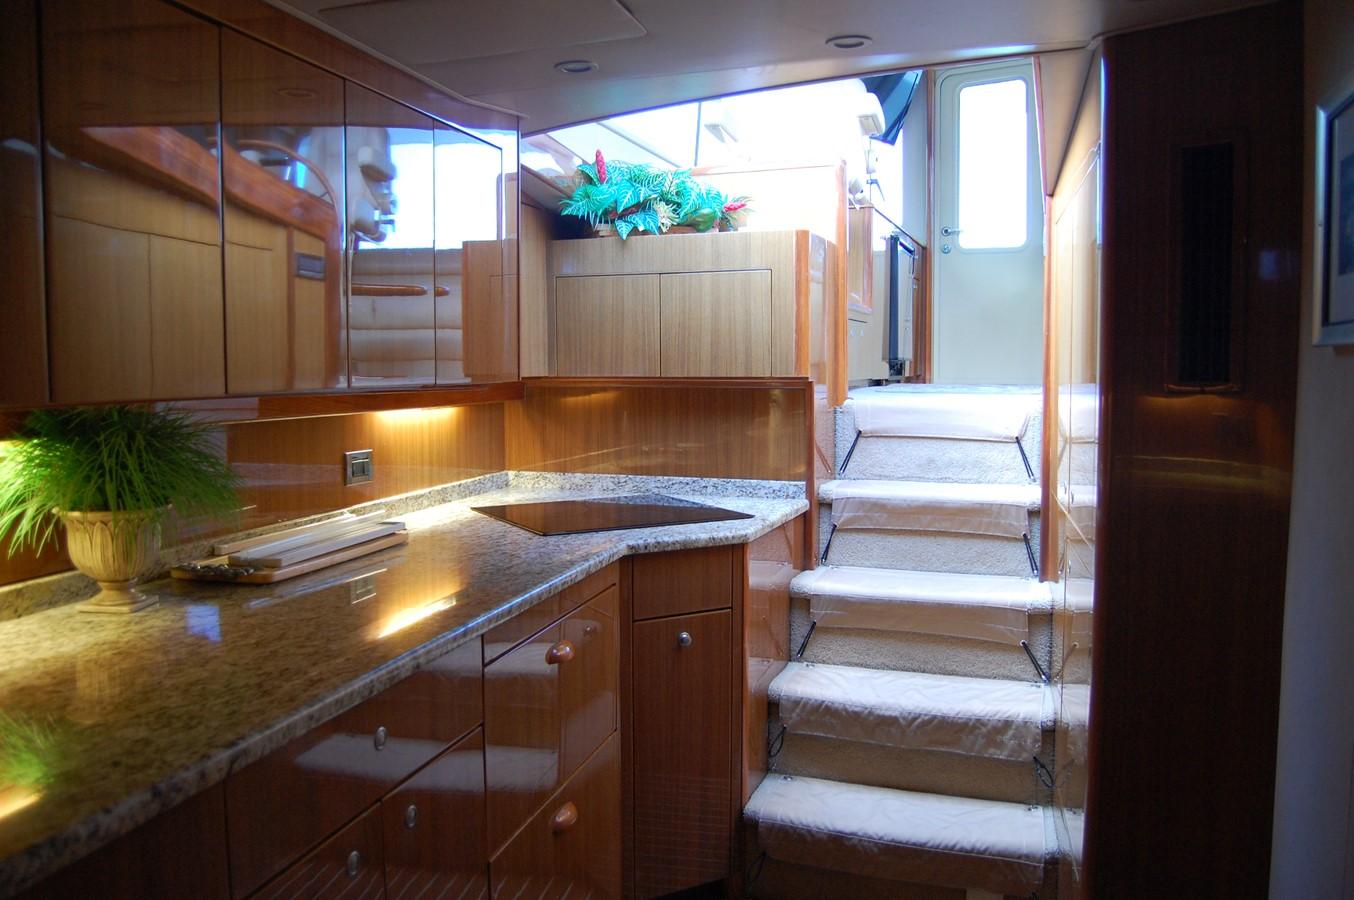 52 Viking 2007 Sport Yacht - 52 VIKING For Sale